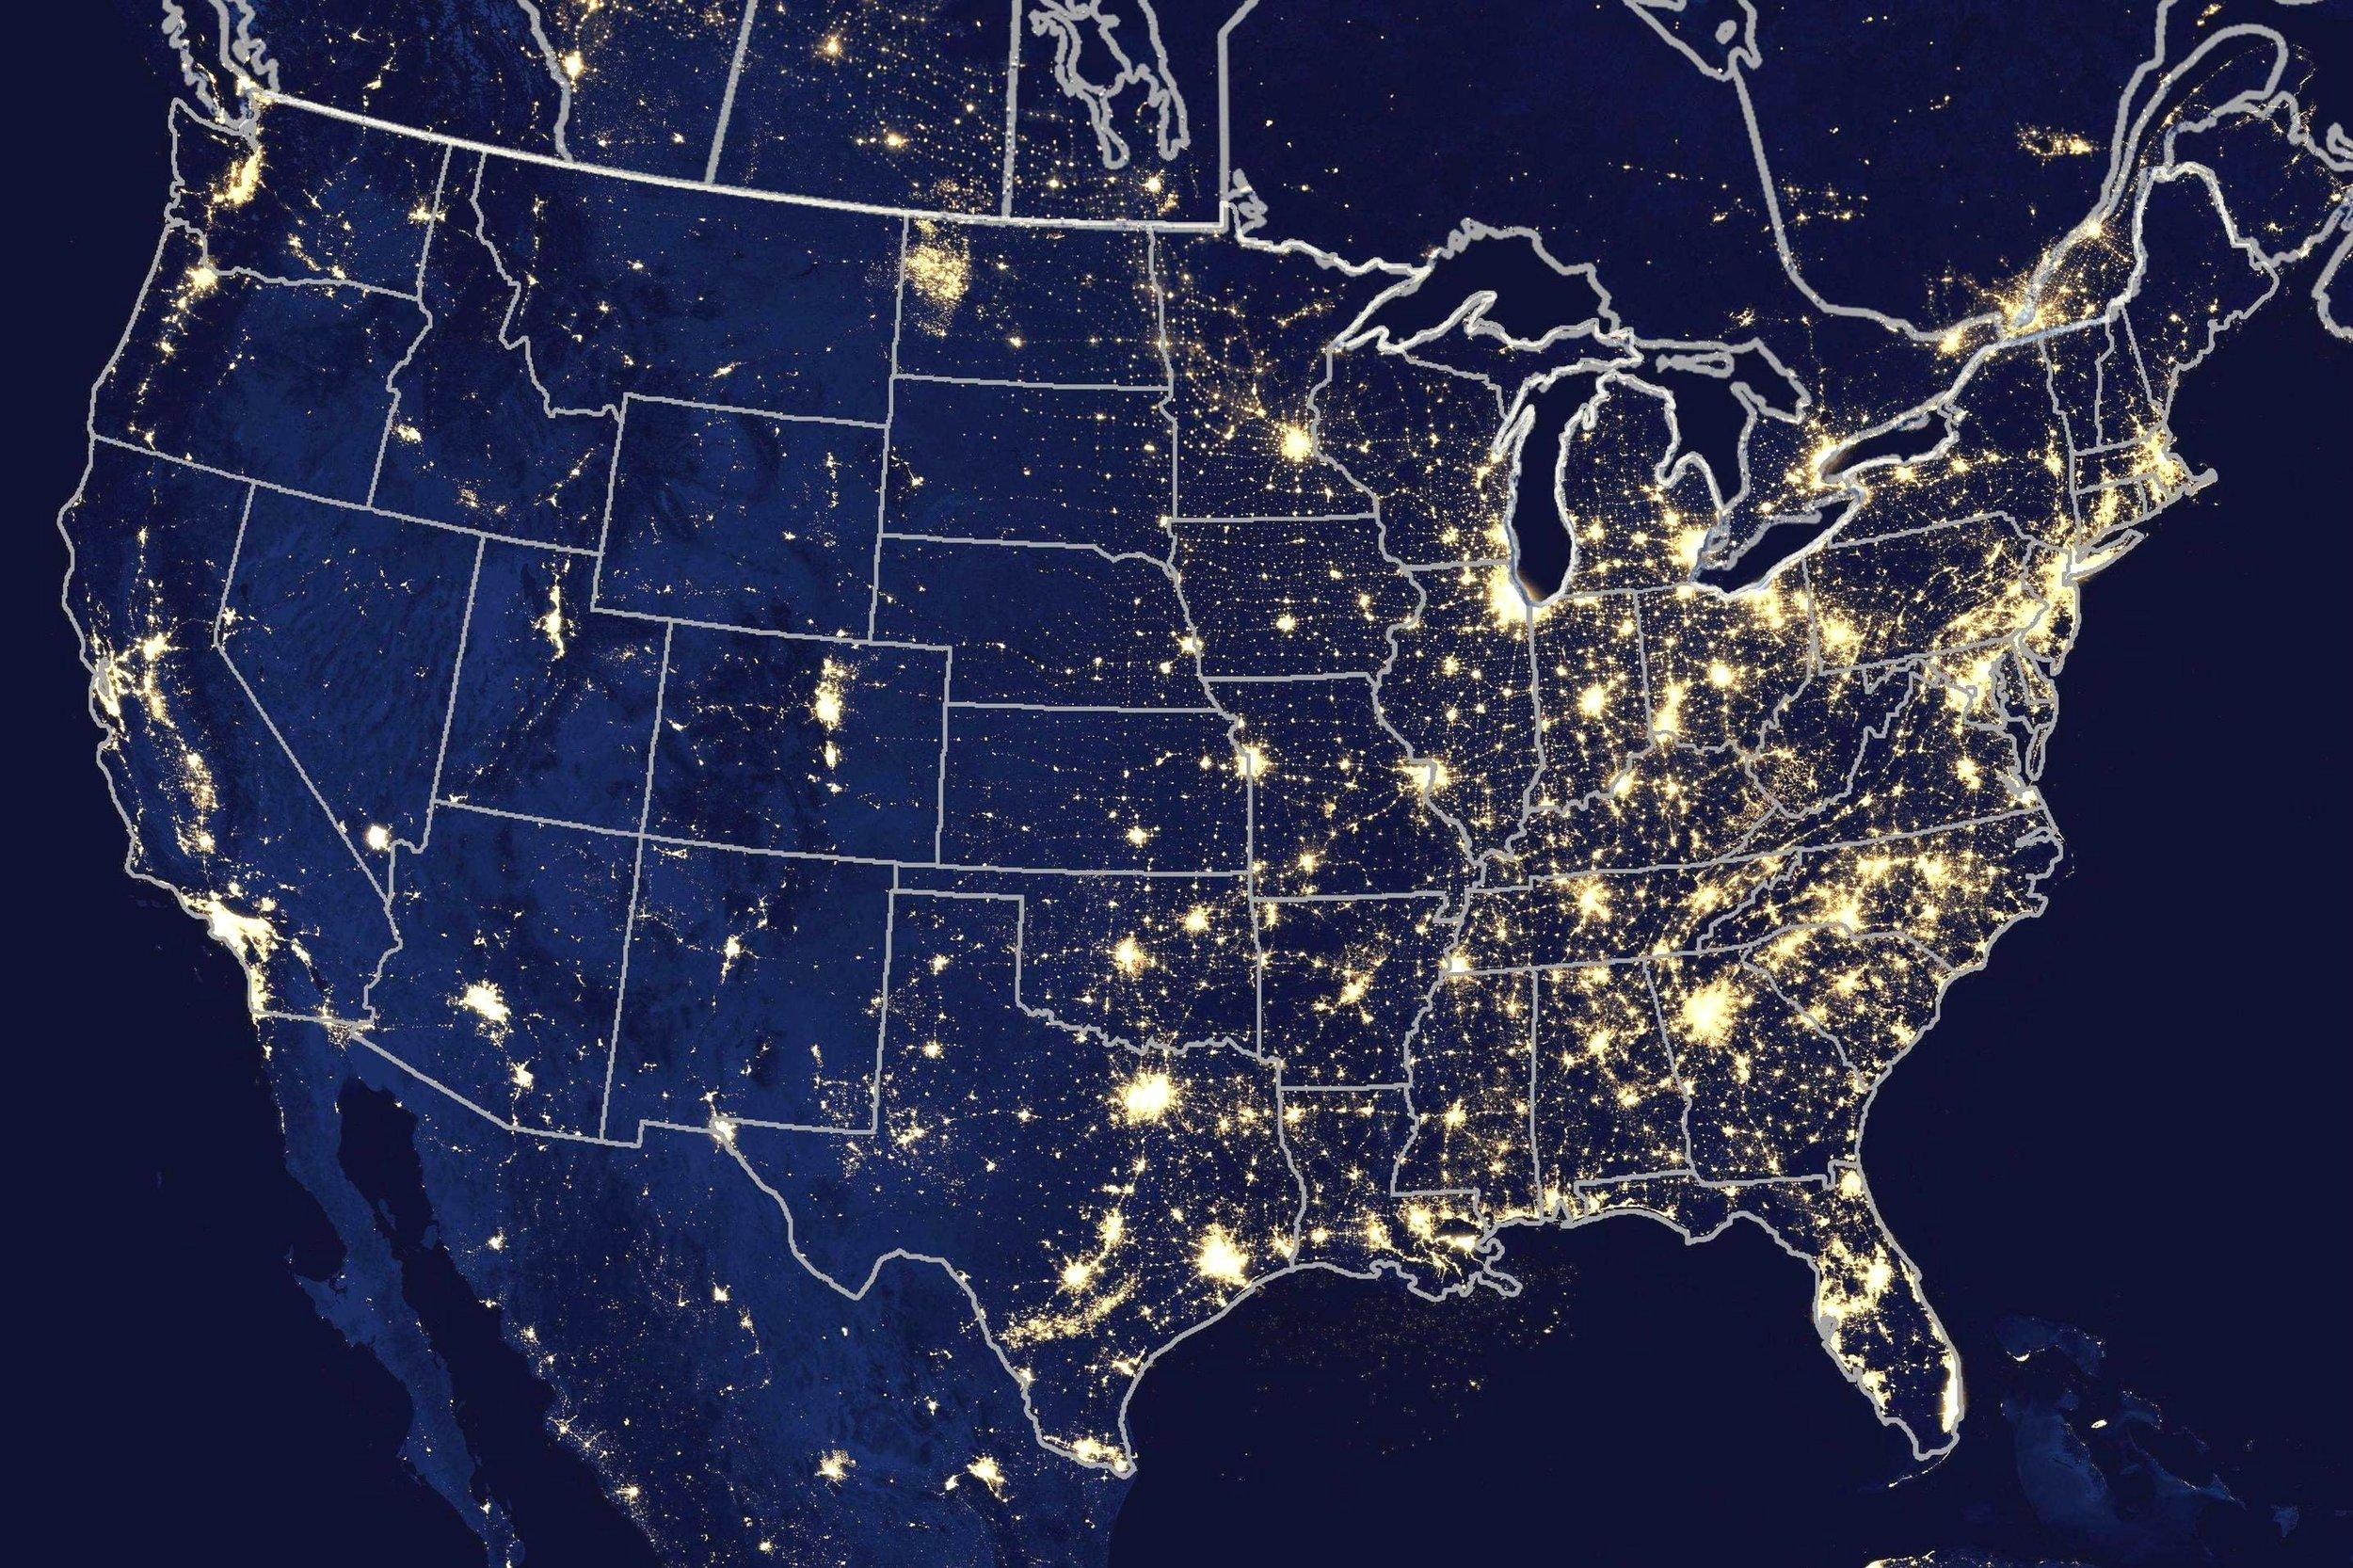 us map night.jpg